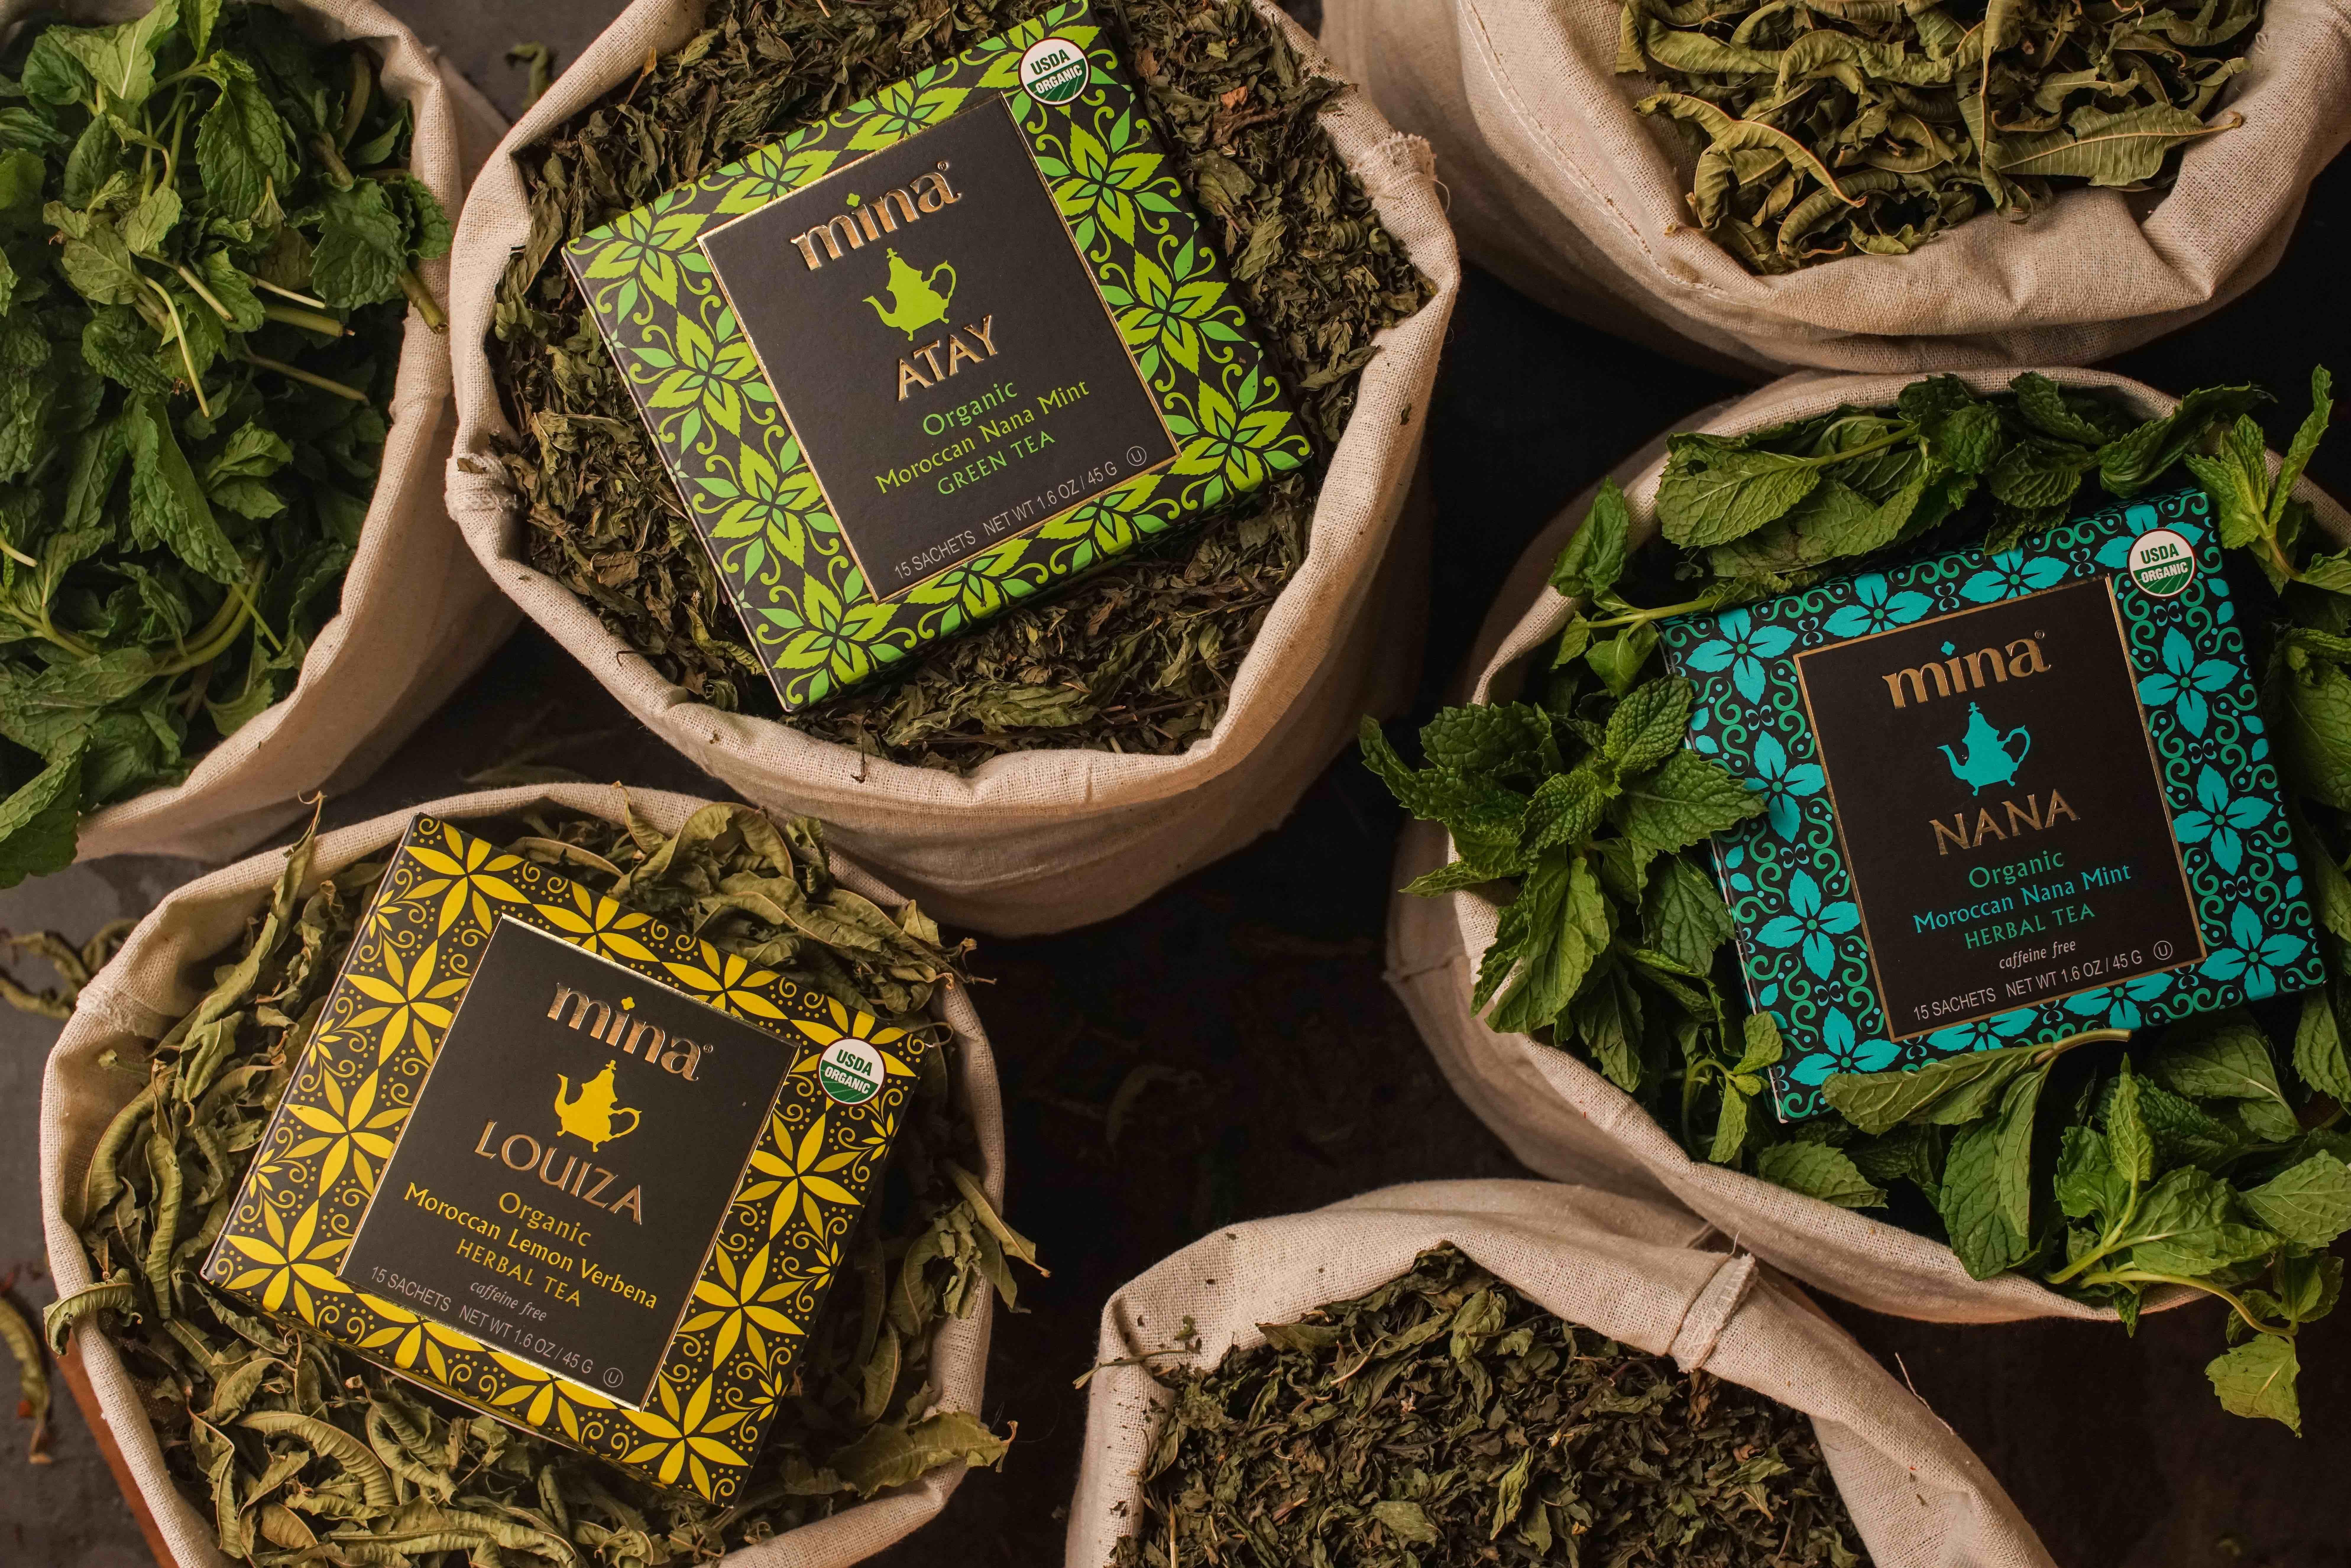 Sip Moroccan tradition. Mina introduces range of organic Moroccan teas.